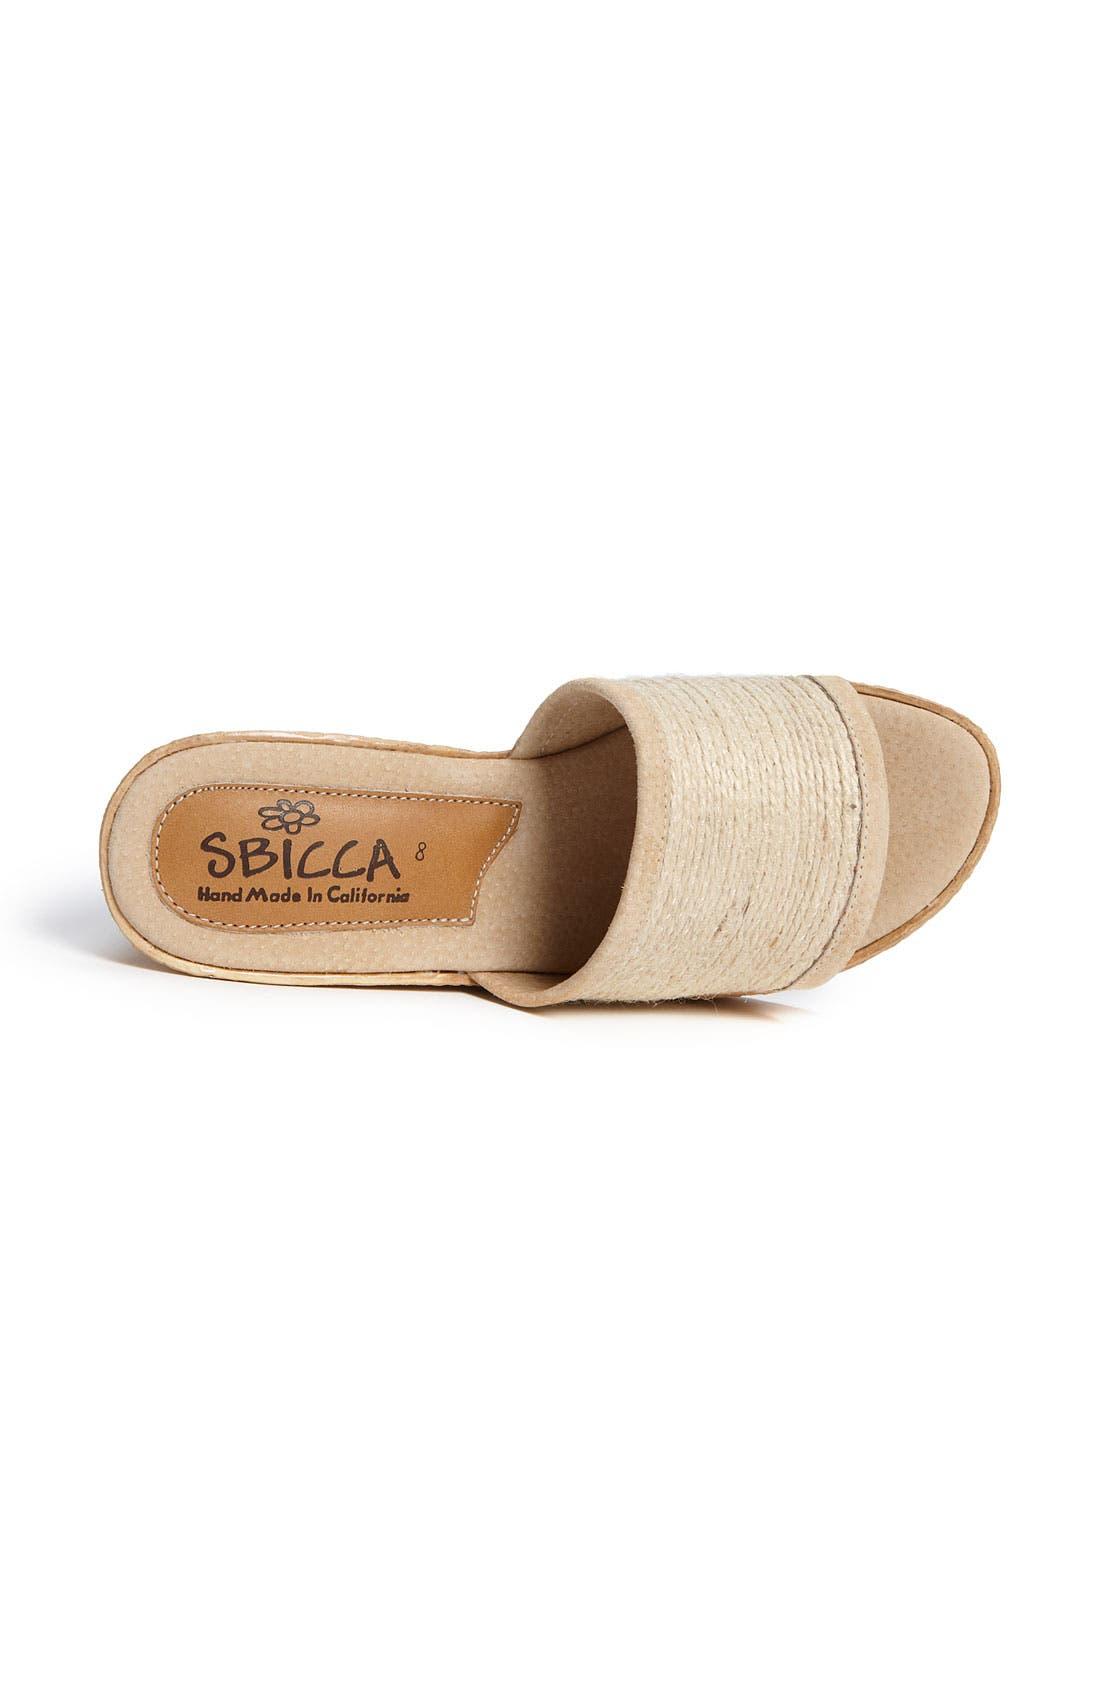 Alternate Image 3  - Sbicca 'Blondie' Sandal